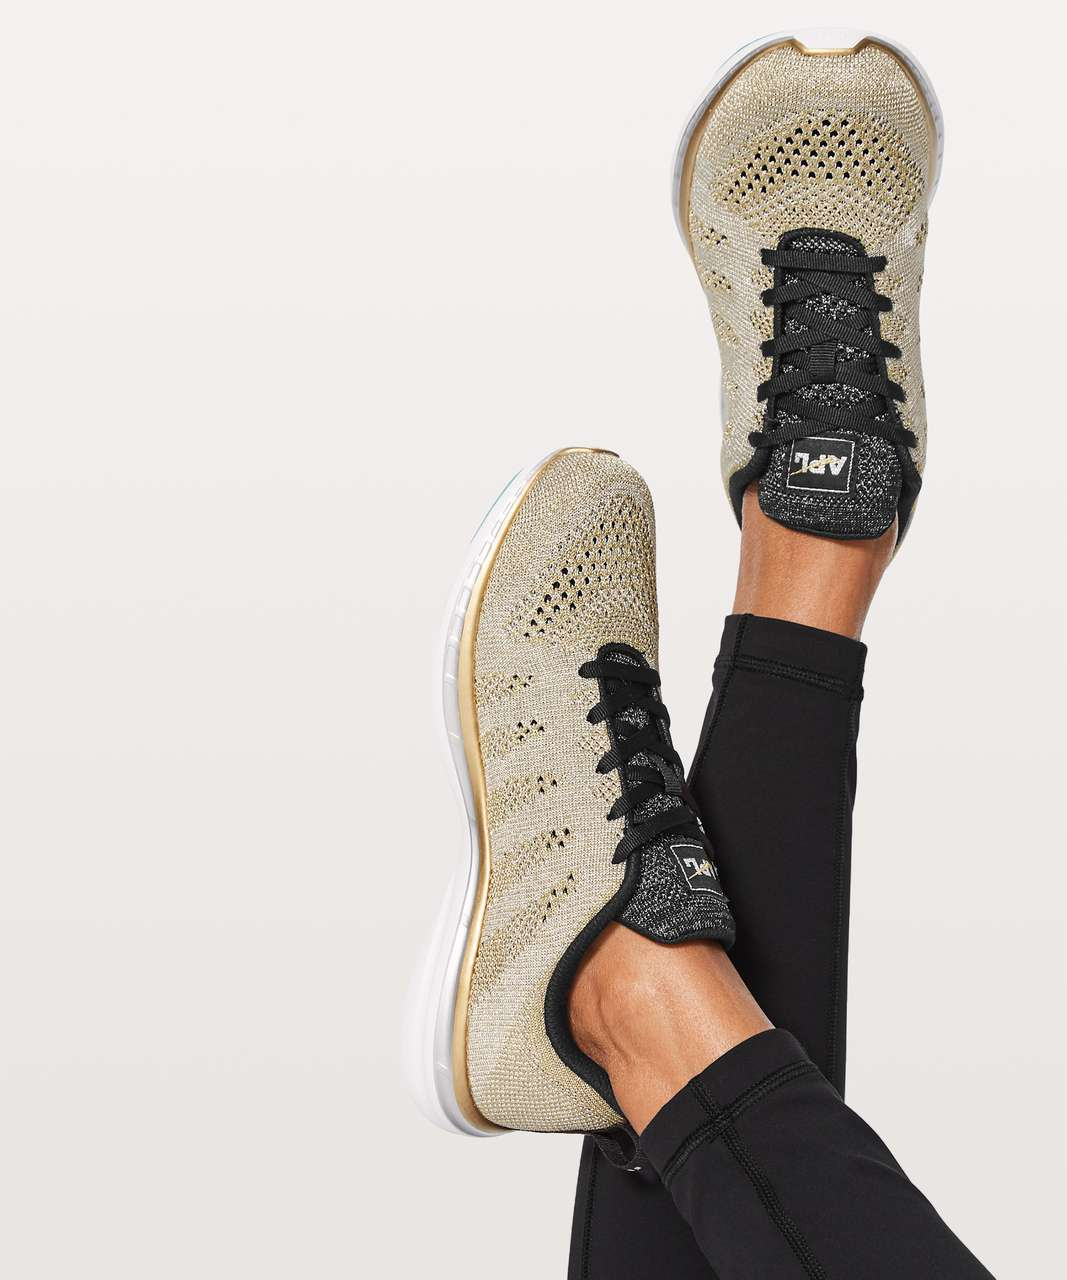 Lululemon Womens TechLoom Pro Shoe